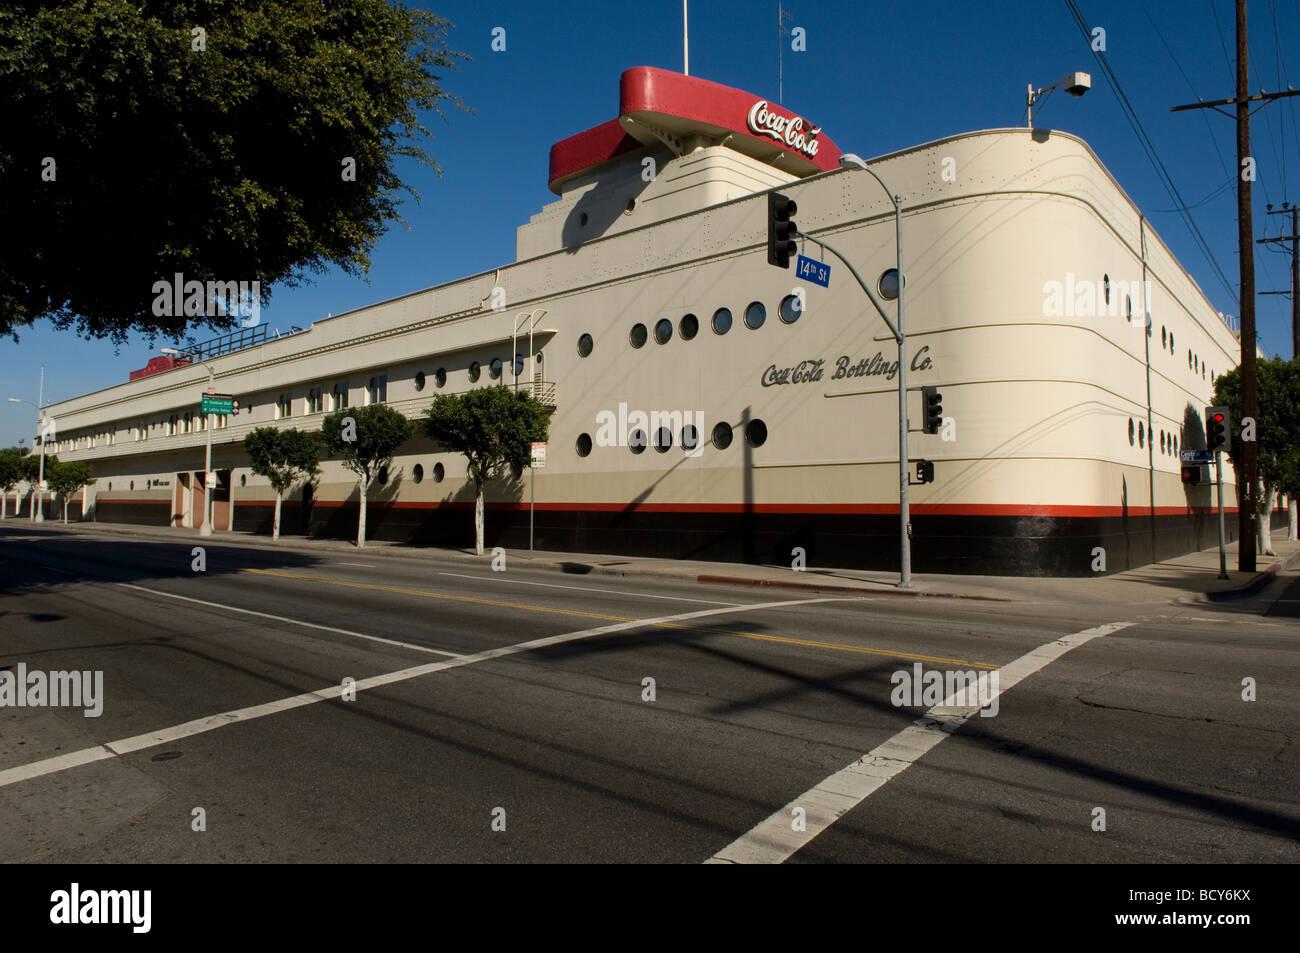 Streamline Moderne Architecture Stock Photos & Streamline Moderne ...